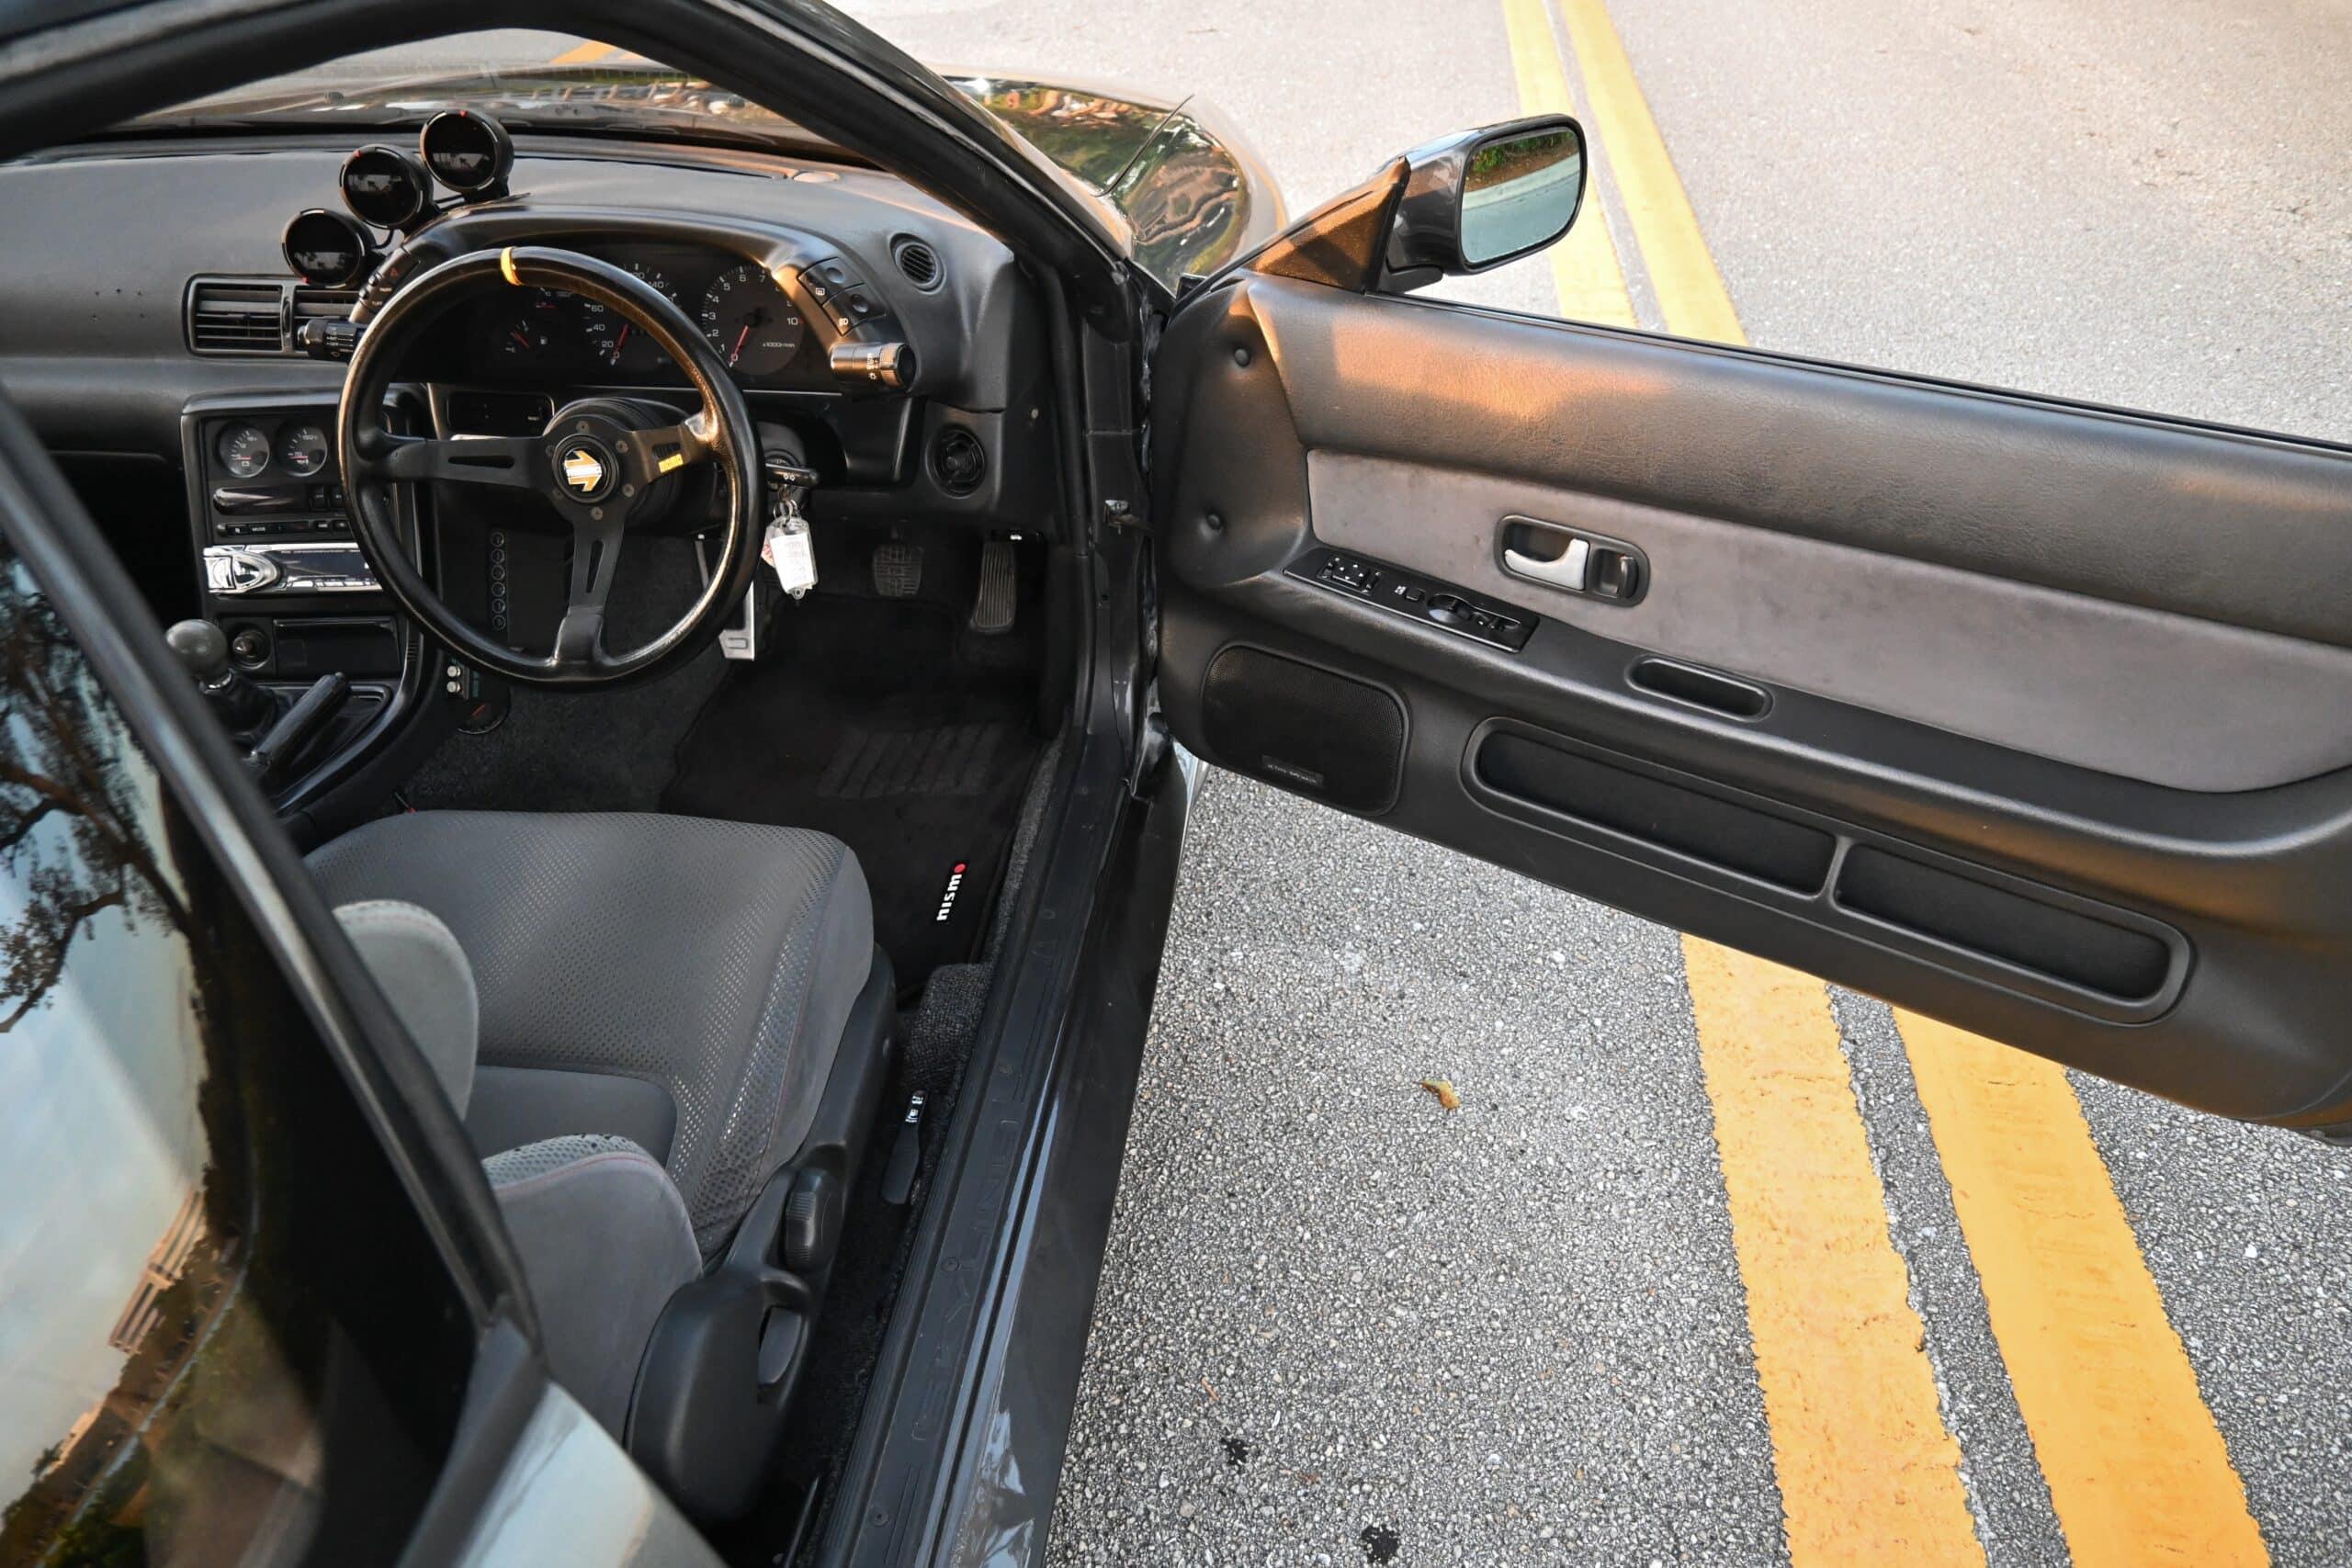 1990 Nissan GT-R R32 Skyline 1 Owner | Authentic Veilside Kit | Well Sorted | Aragosta | TE37 | 89k Orig. Km